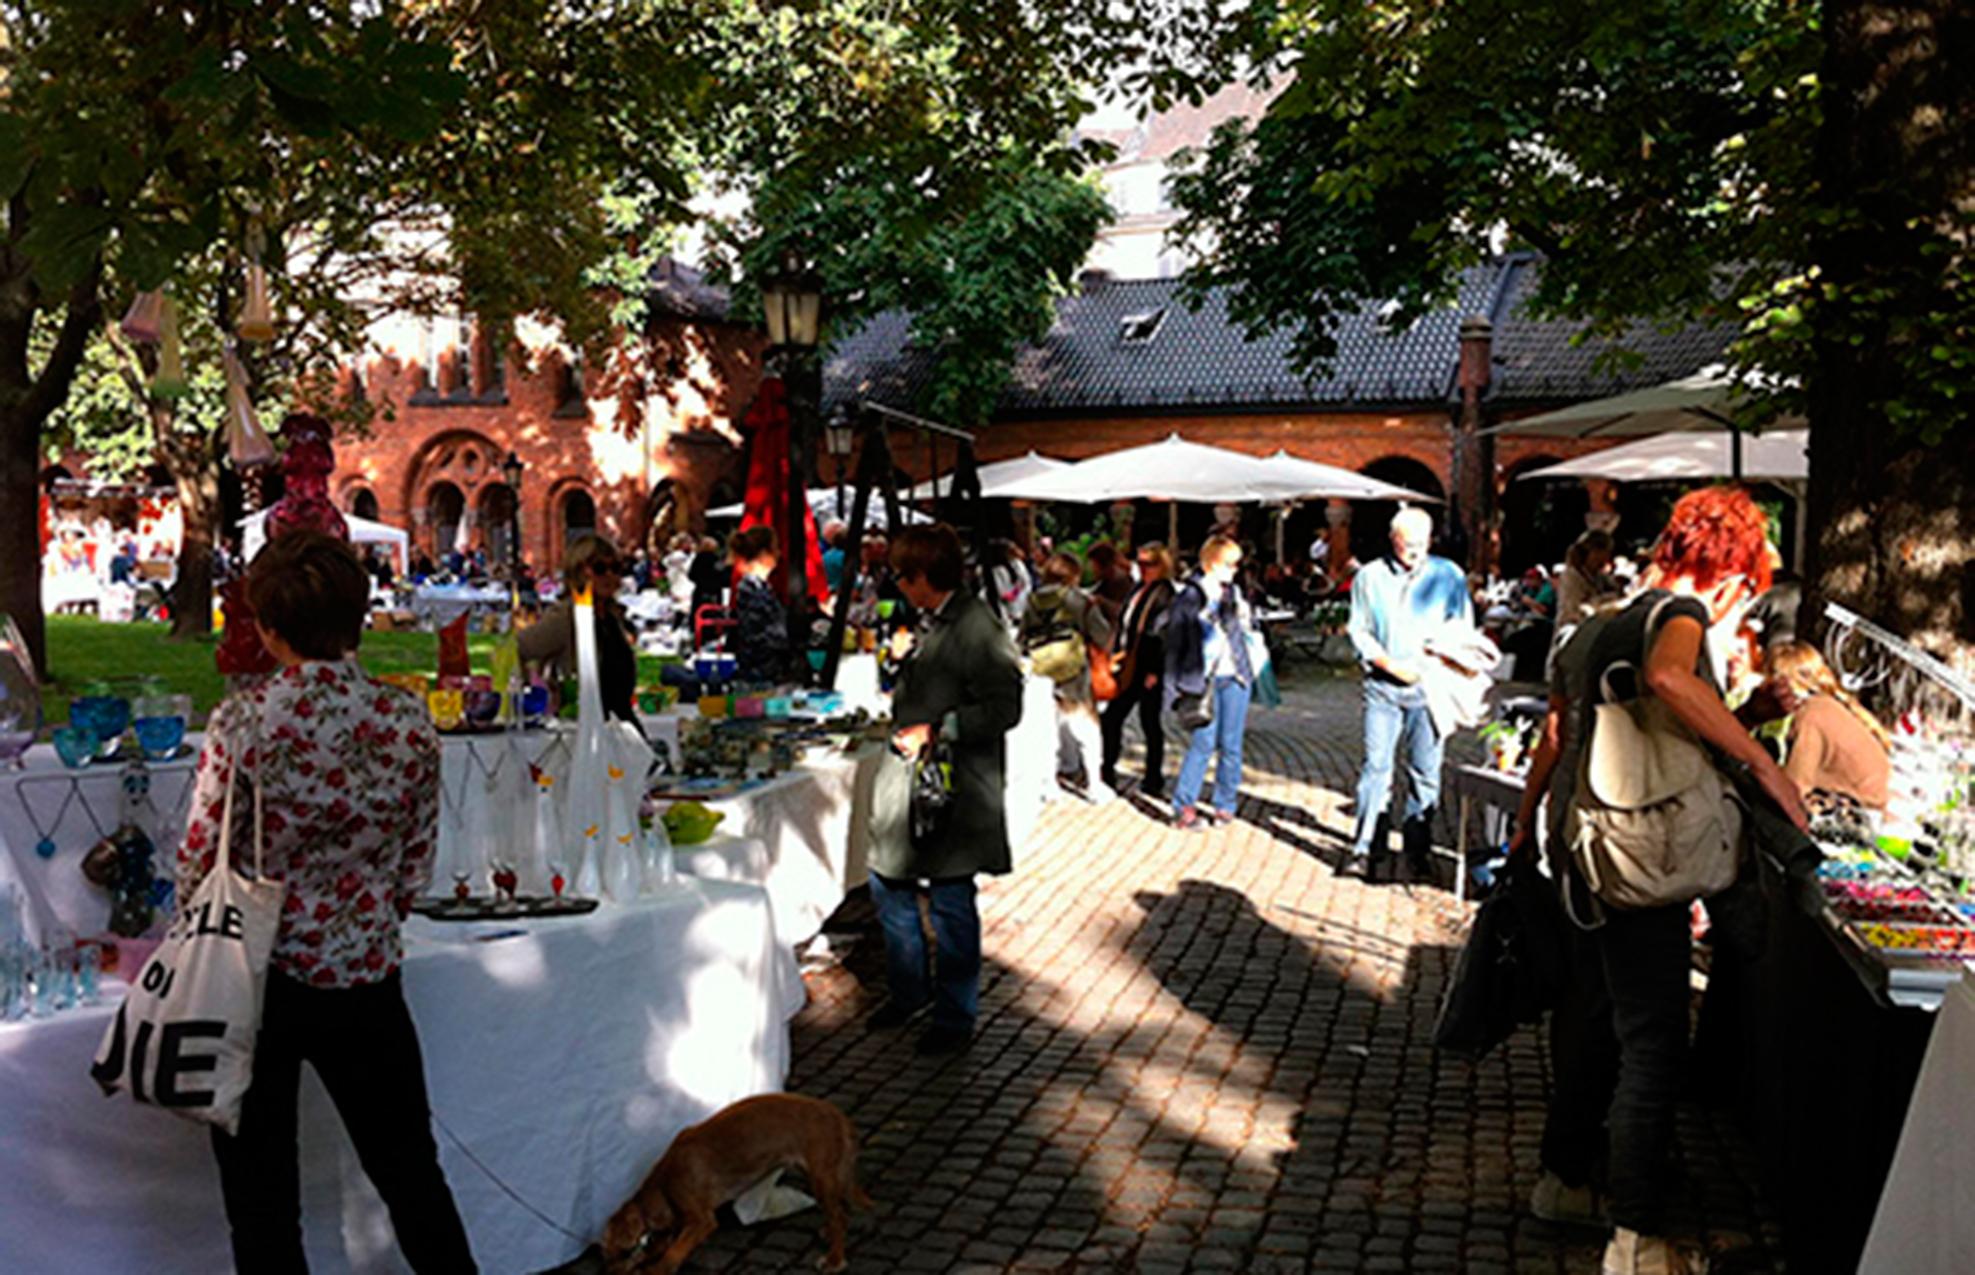 Kunsthåndtverkmarkedet, 18. – 20. juli 2017